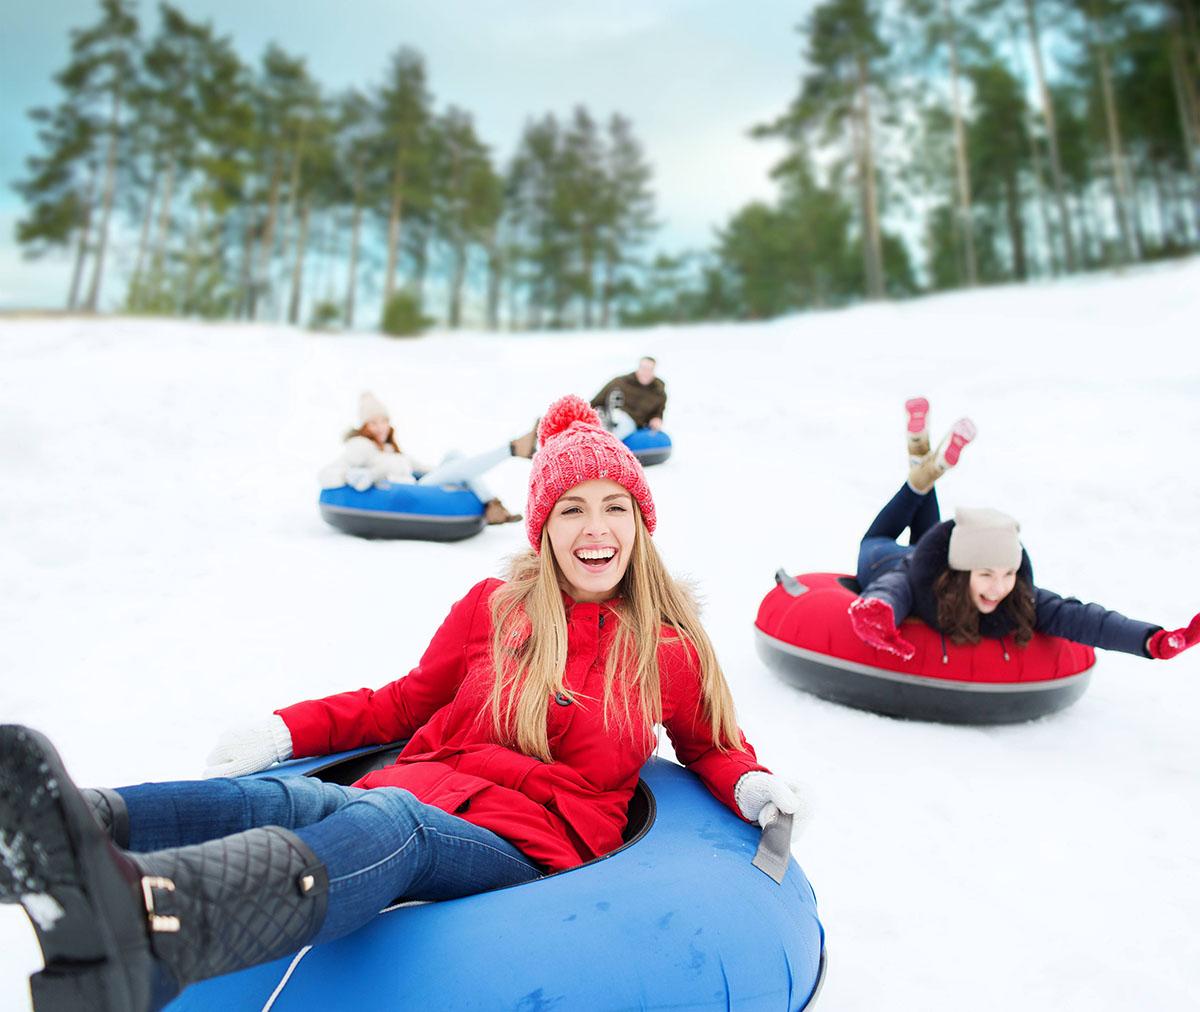 Winter Fun and Adventure